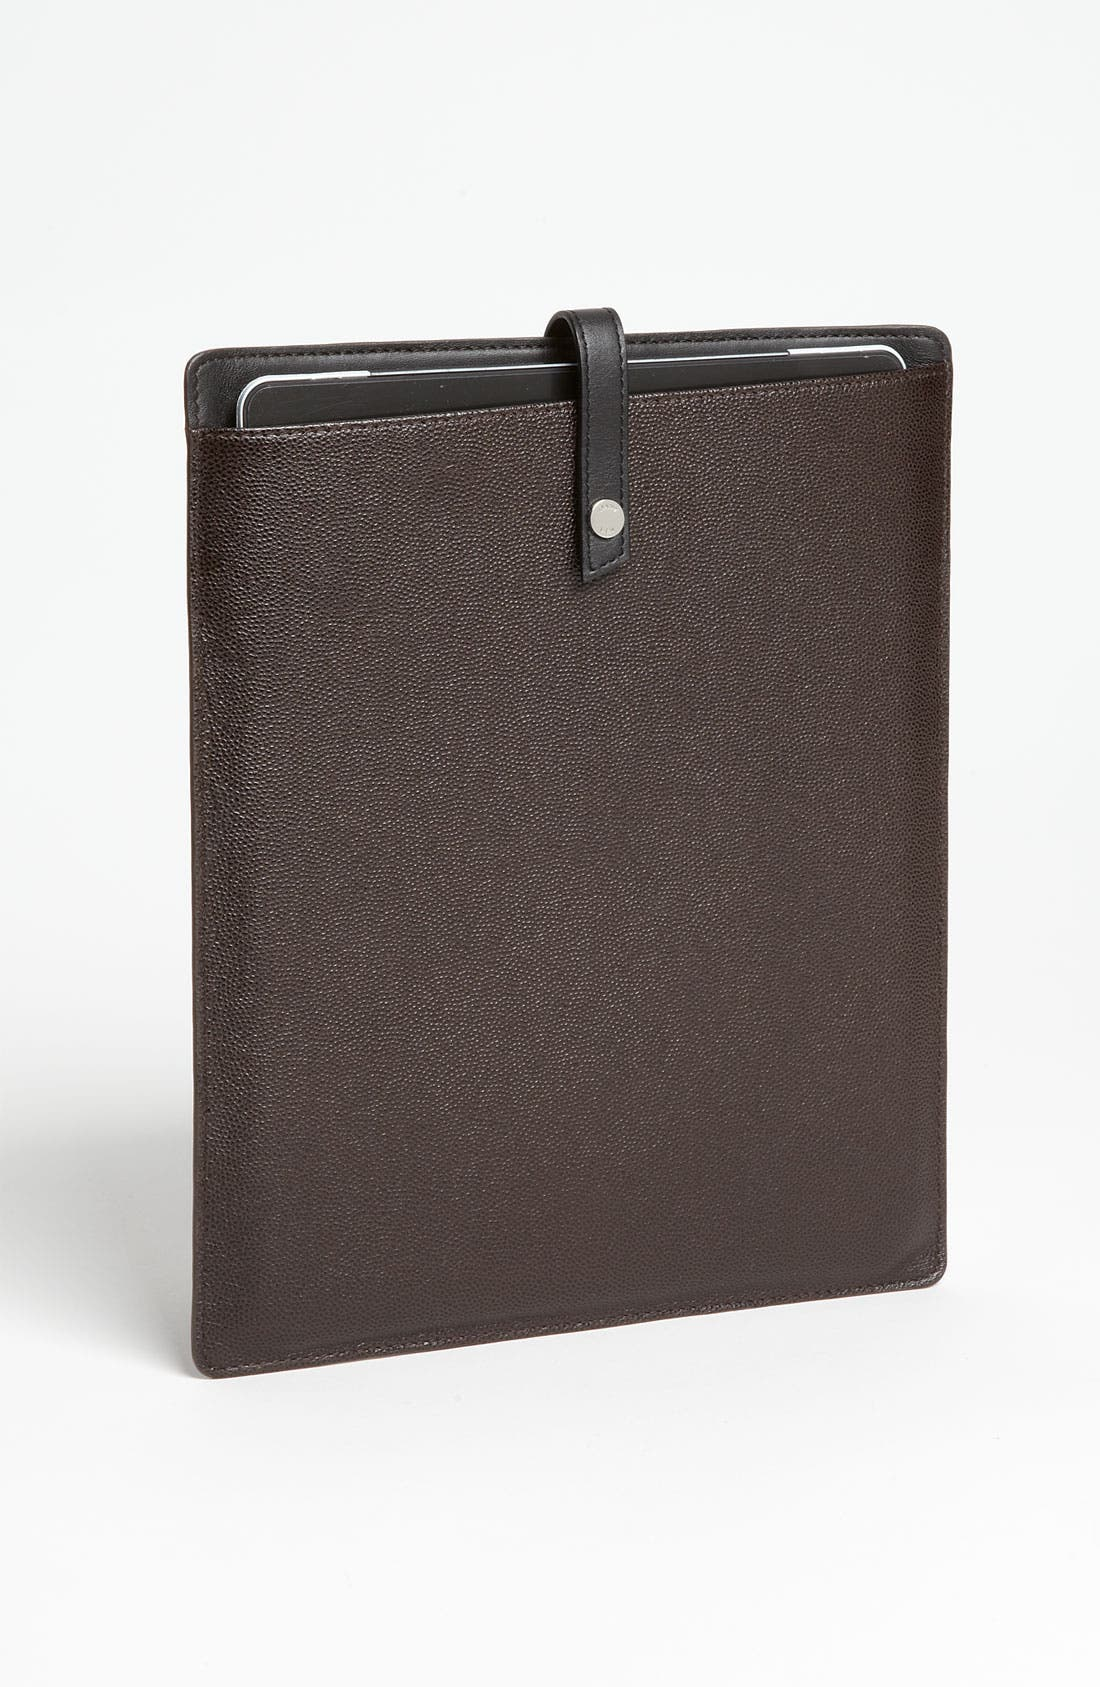 Alternate Image 1 Selected - WANT Les Essentiels de la Vie 'Capital' iPad 2 Leather Sleeve